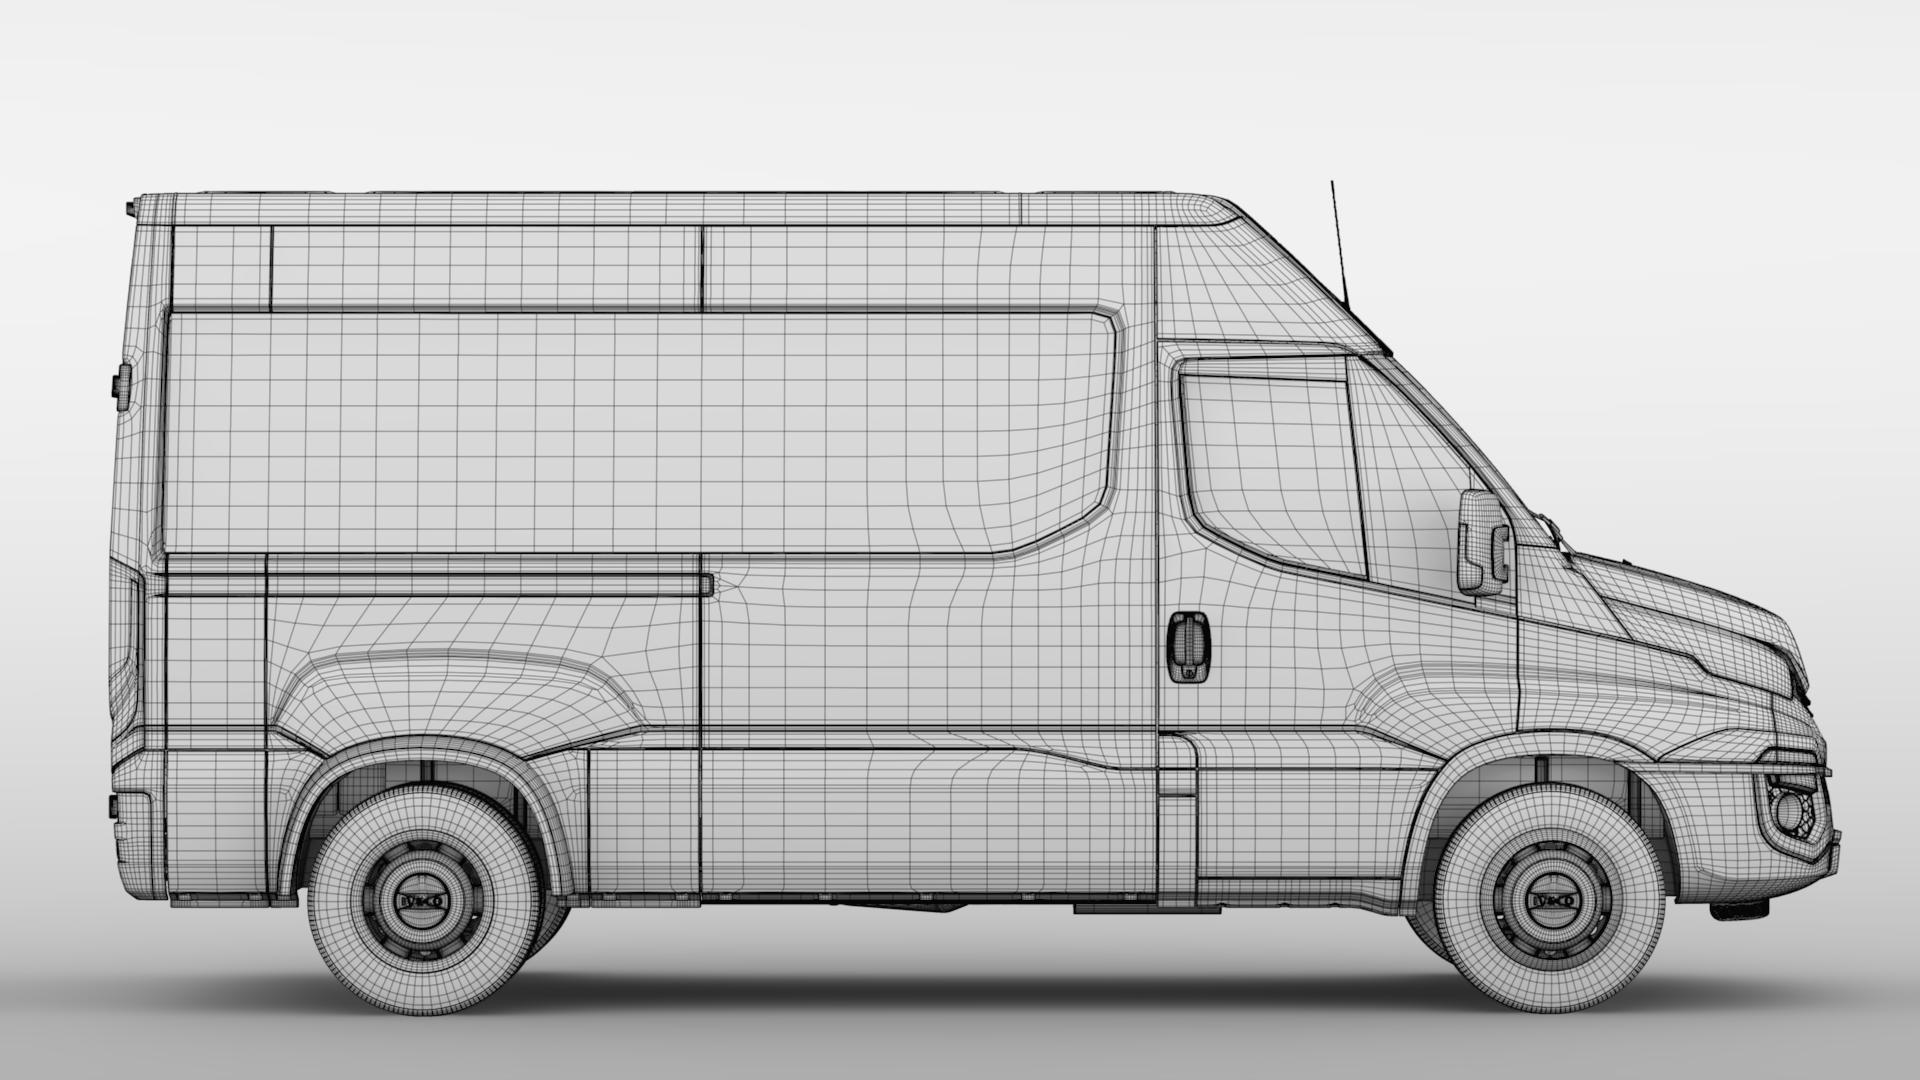 iveco daily minibus l2h2 2017 3d model max fbx c4d lwo ma mb hrc xsi obj 276026